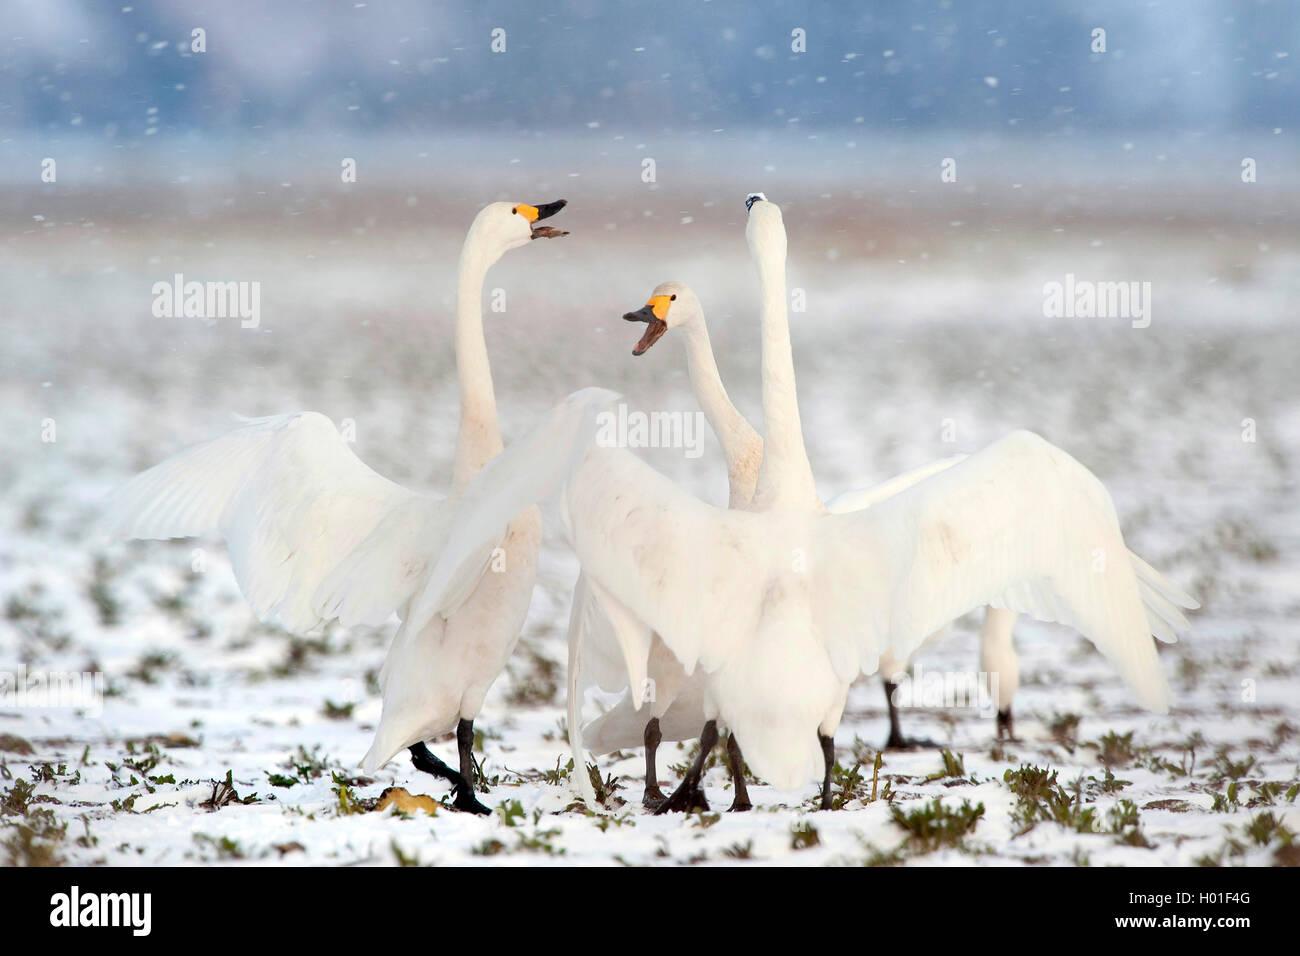 Singschwan, Sing-Schwan (Cygnus cygnus), drei Singschwaene bei Schneefall, Schweden   cygne chanteur (Cygnus cygnus), trois whoope Banque D'Images